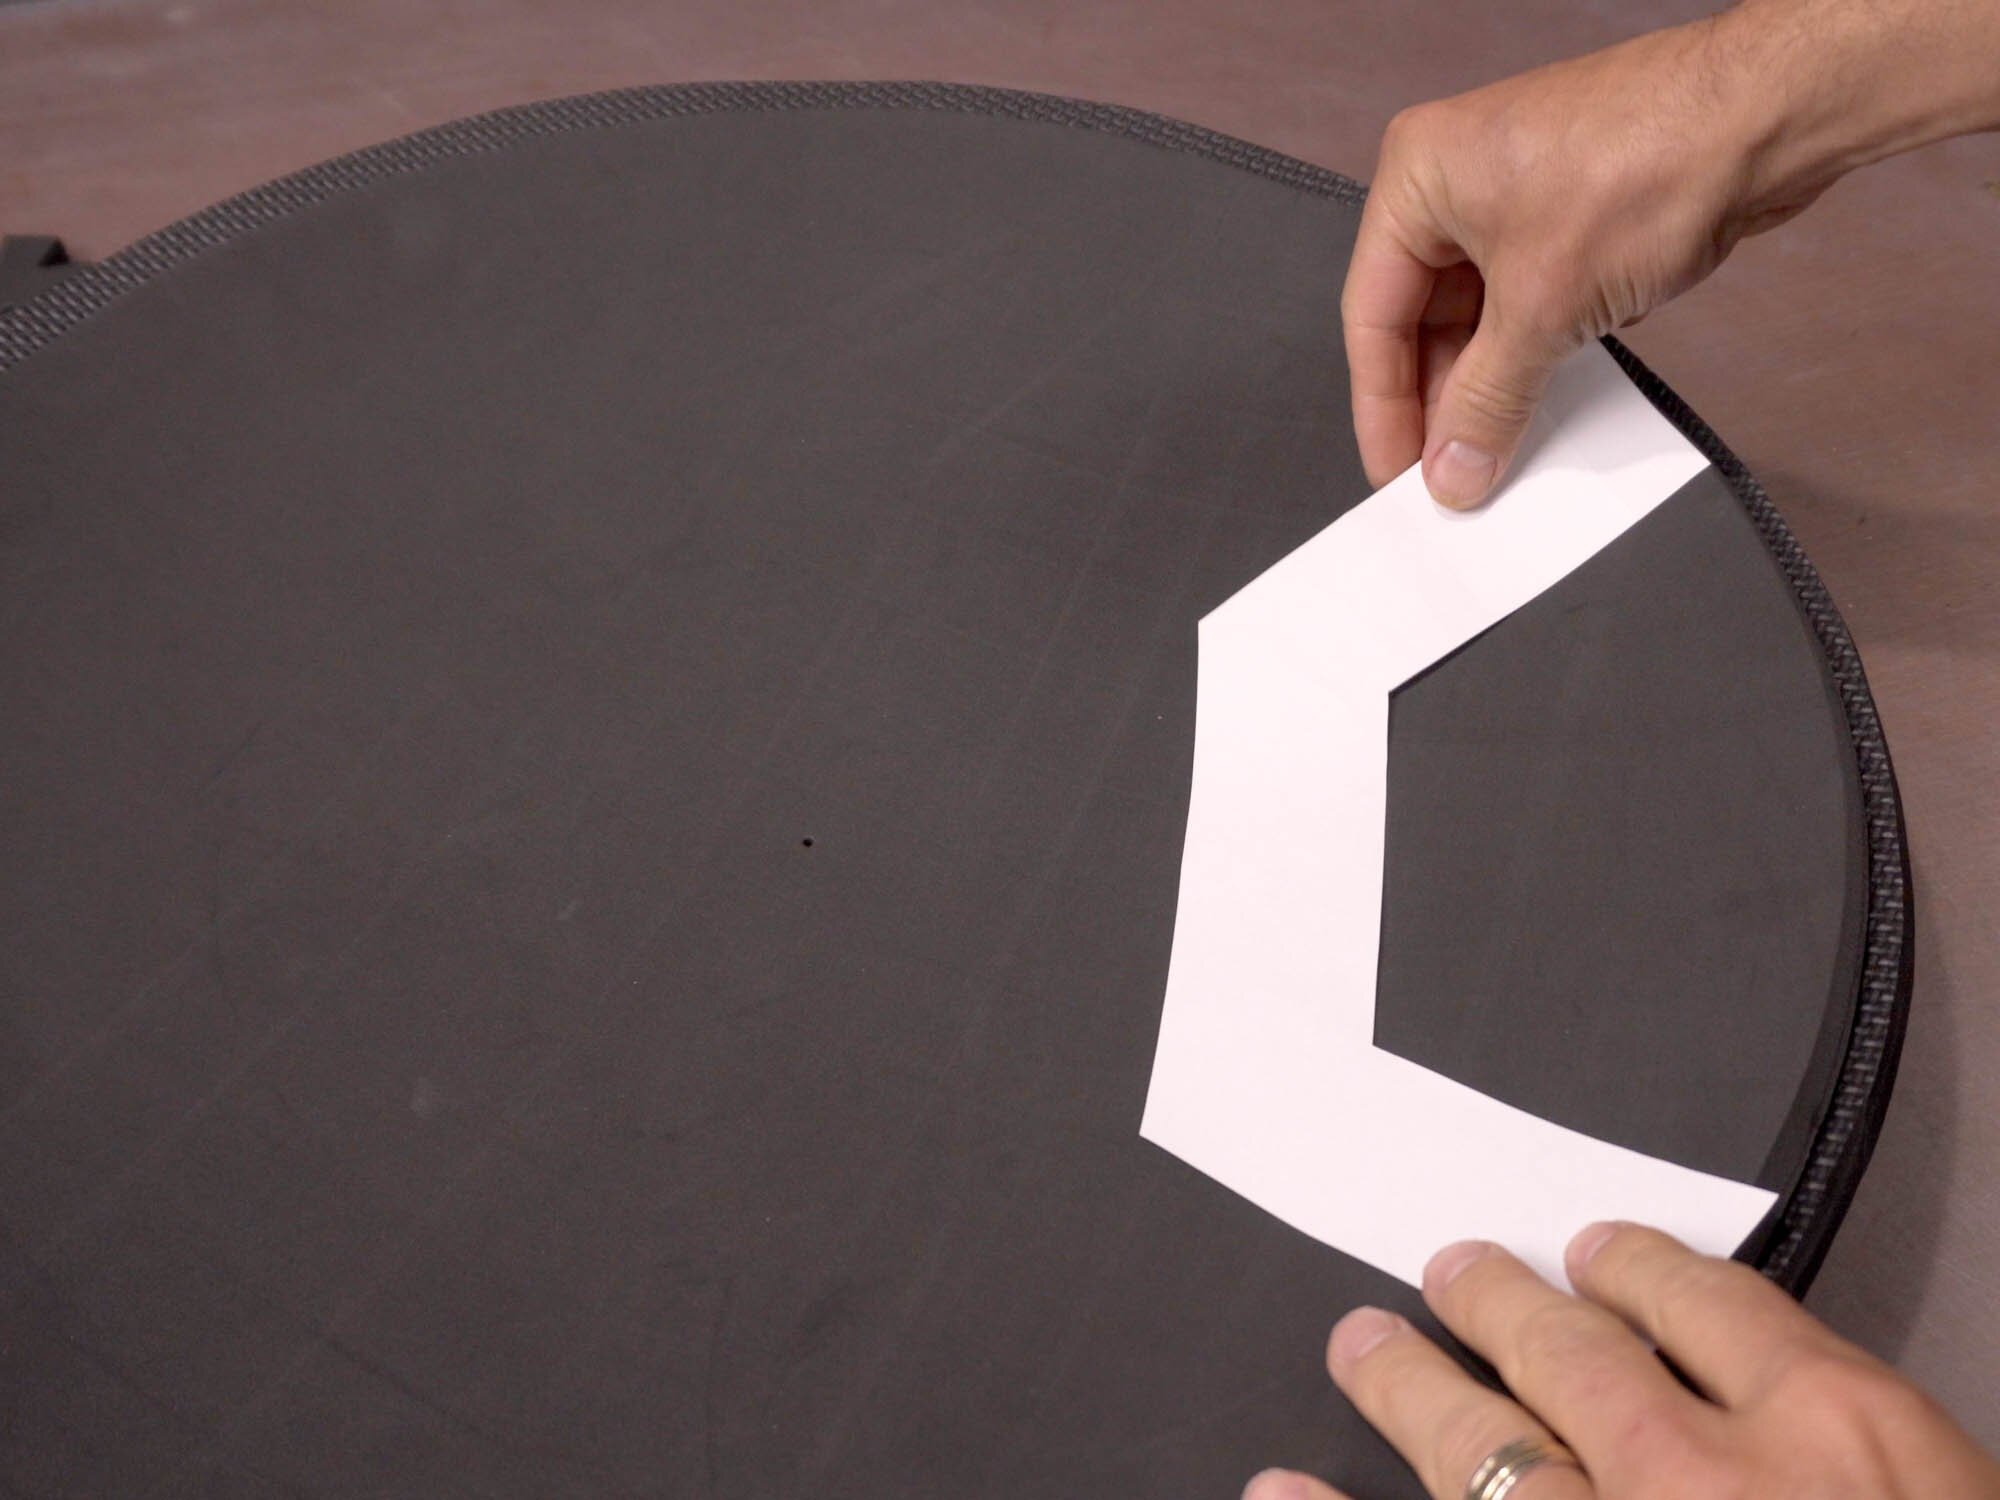 instruct shield (8 of 8).jpg